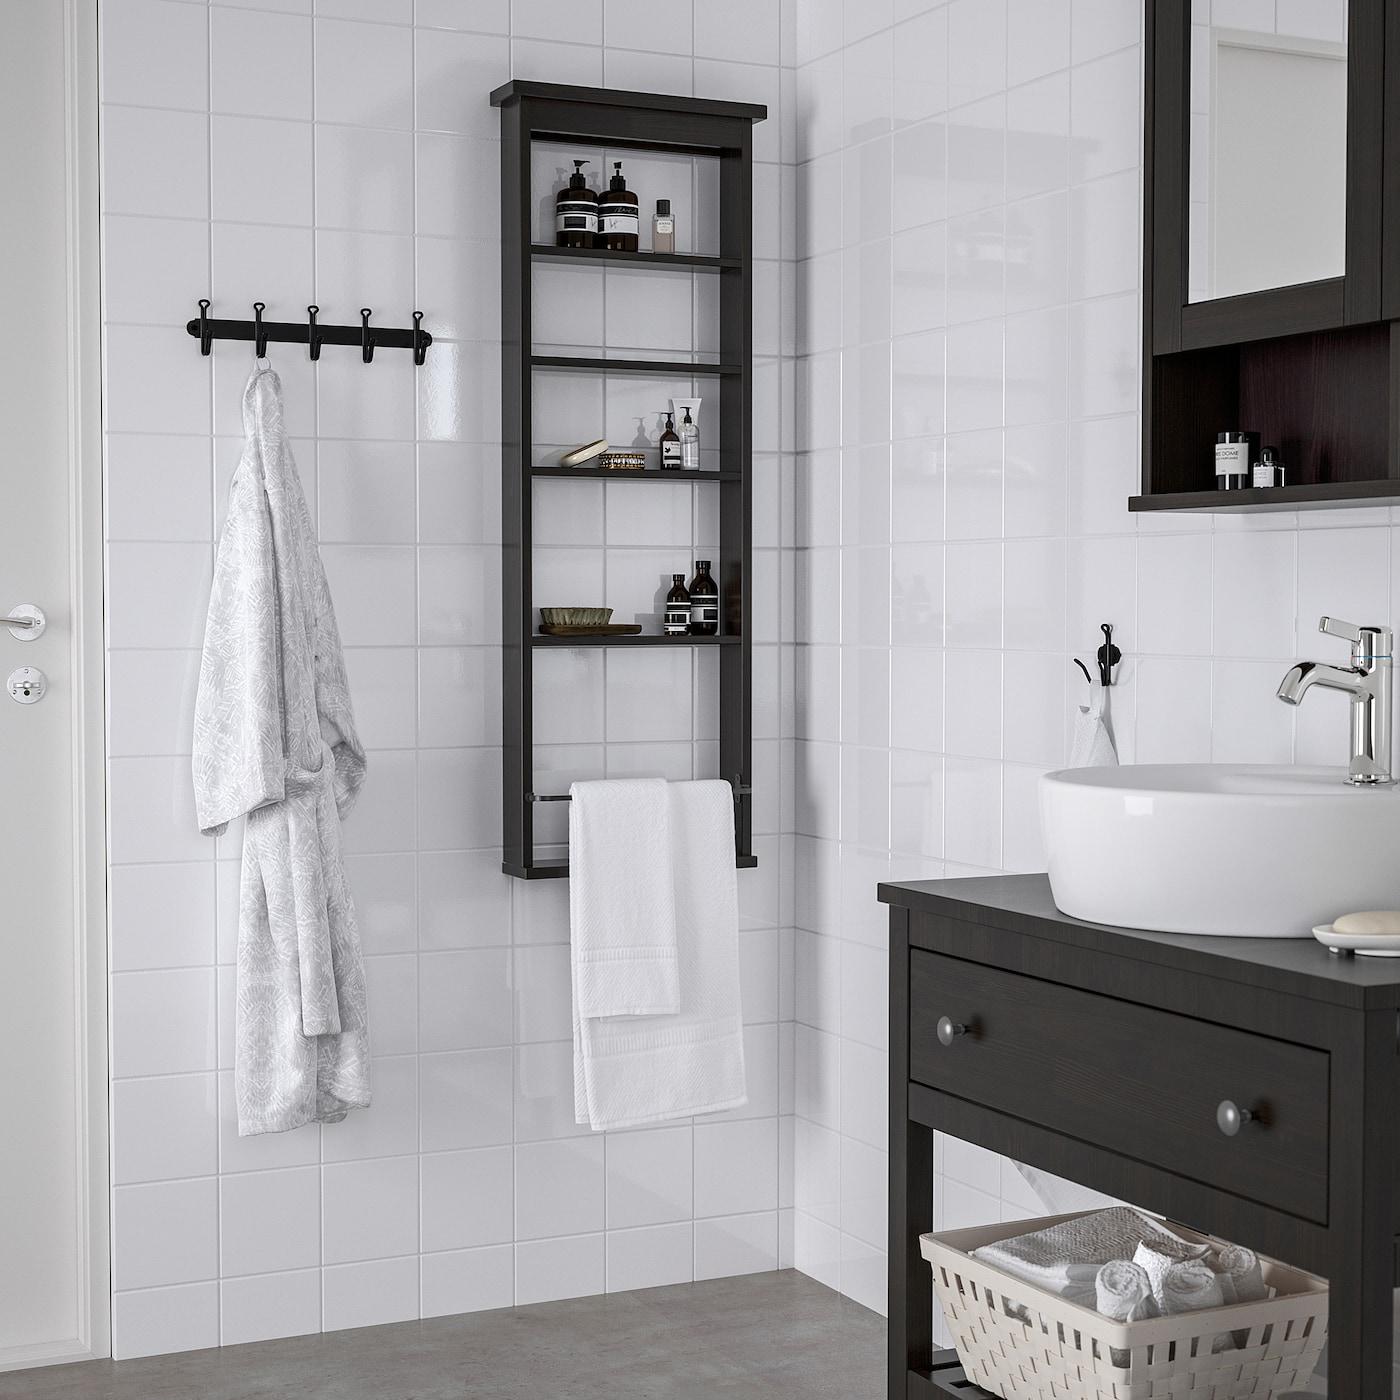 Picture of: Hemnes Wall Shelf Black Brown 16 1 2×46 1 2 Ikea